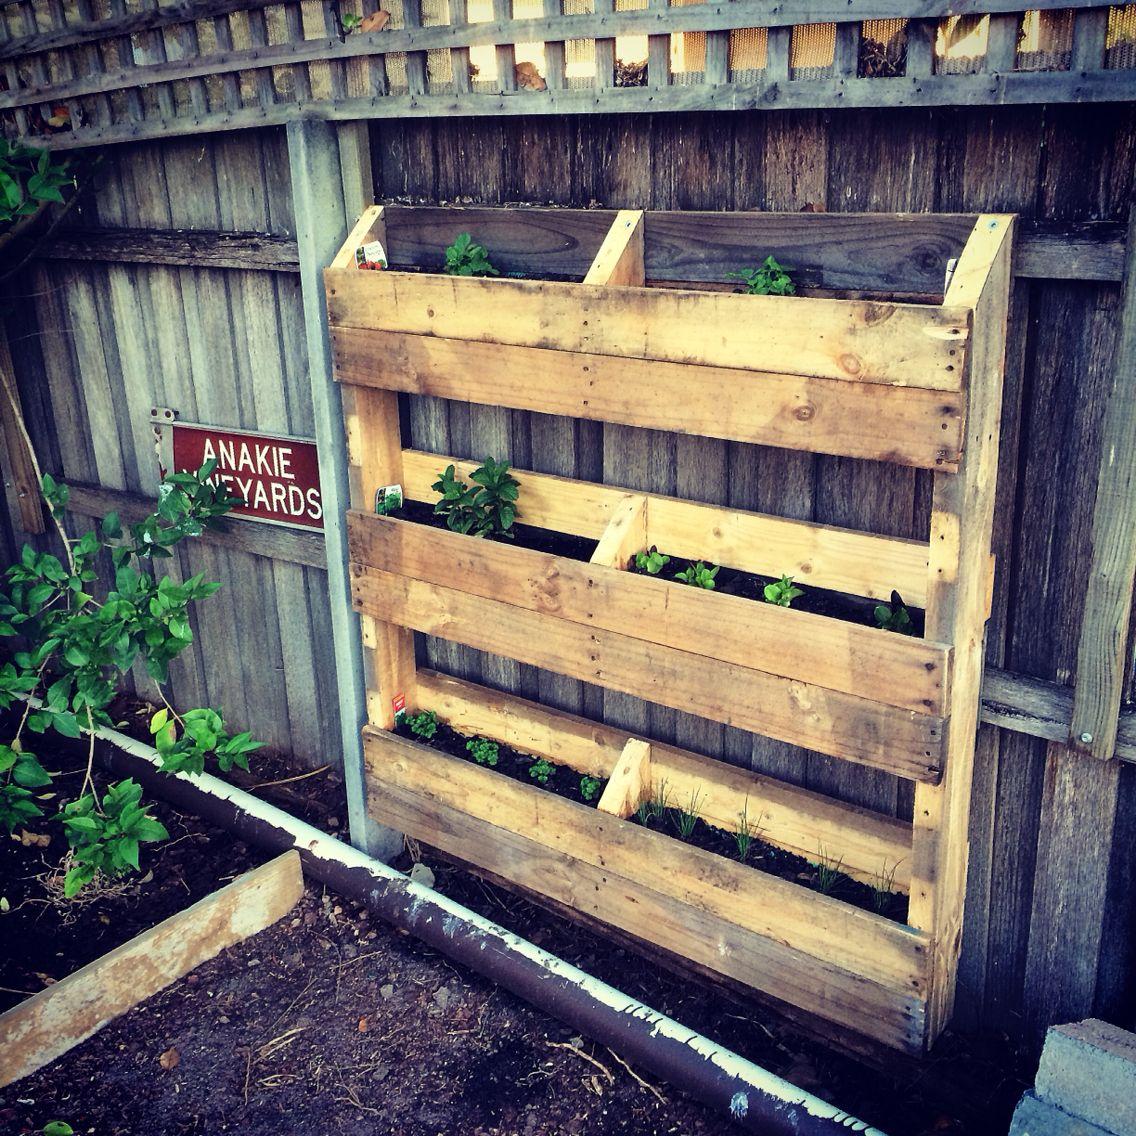 Pallet garden / wall garden | Healthy You Inc | Pinterest | Pallet ...